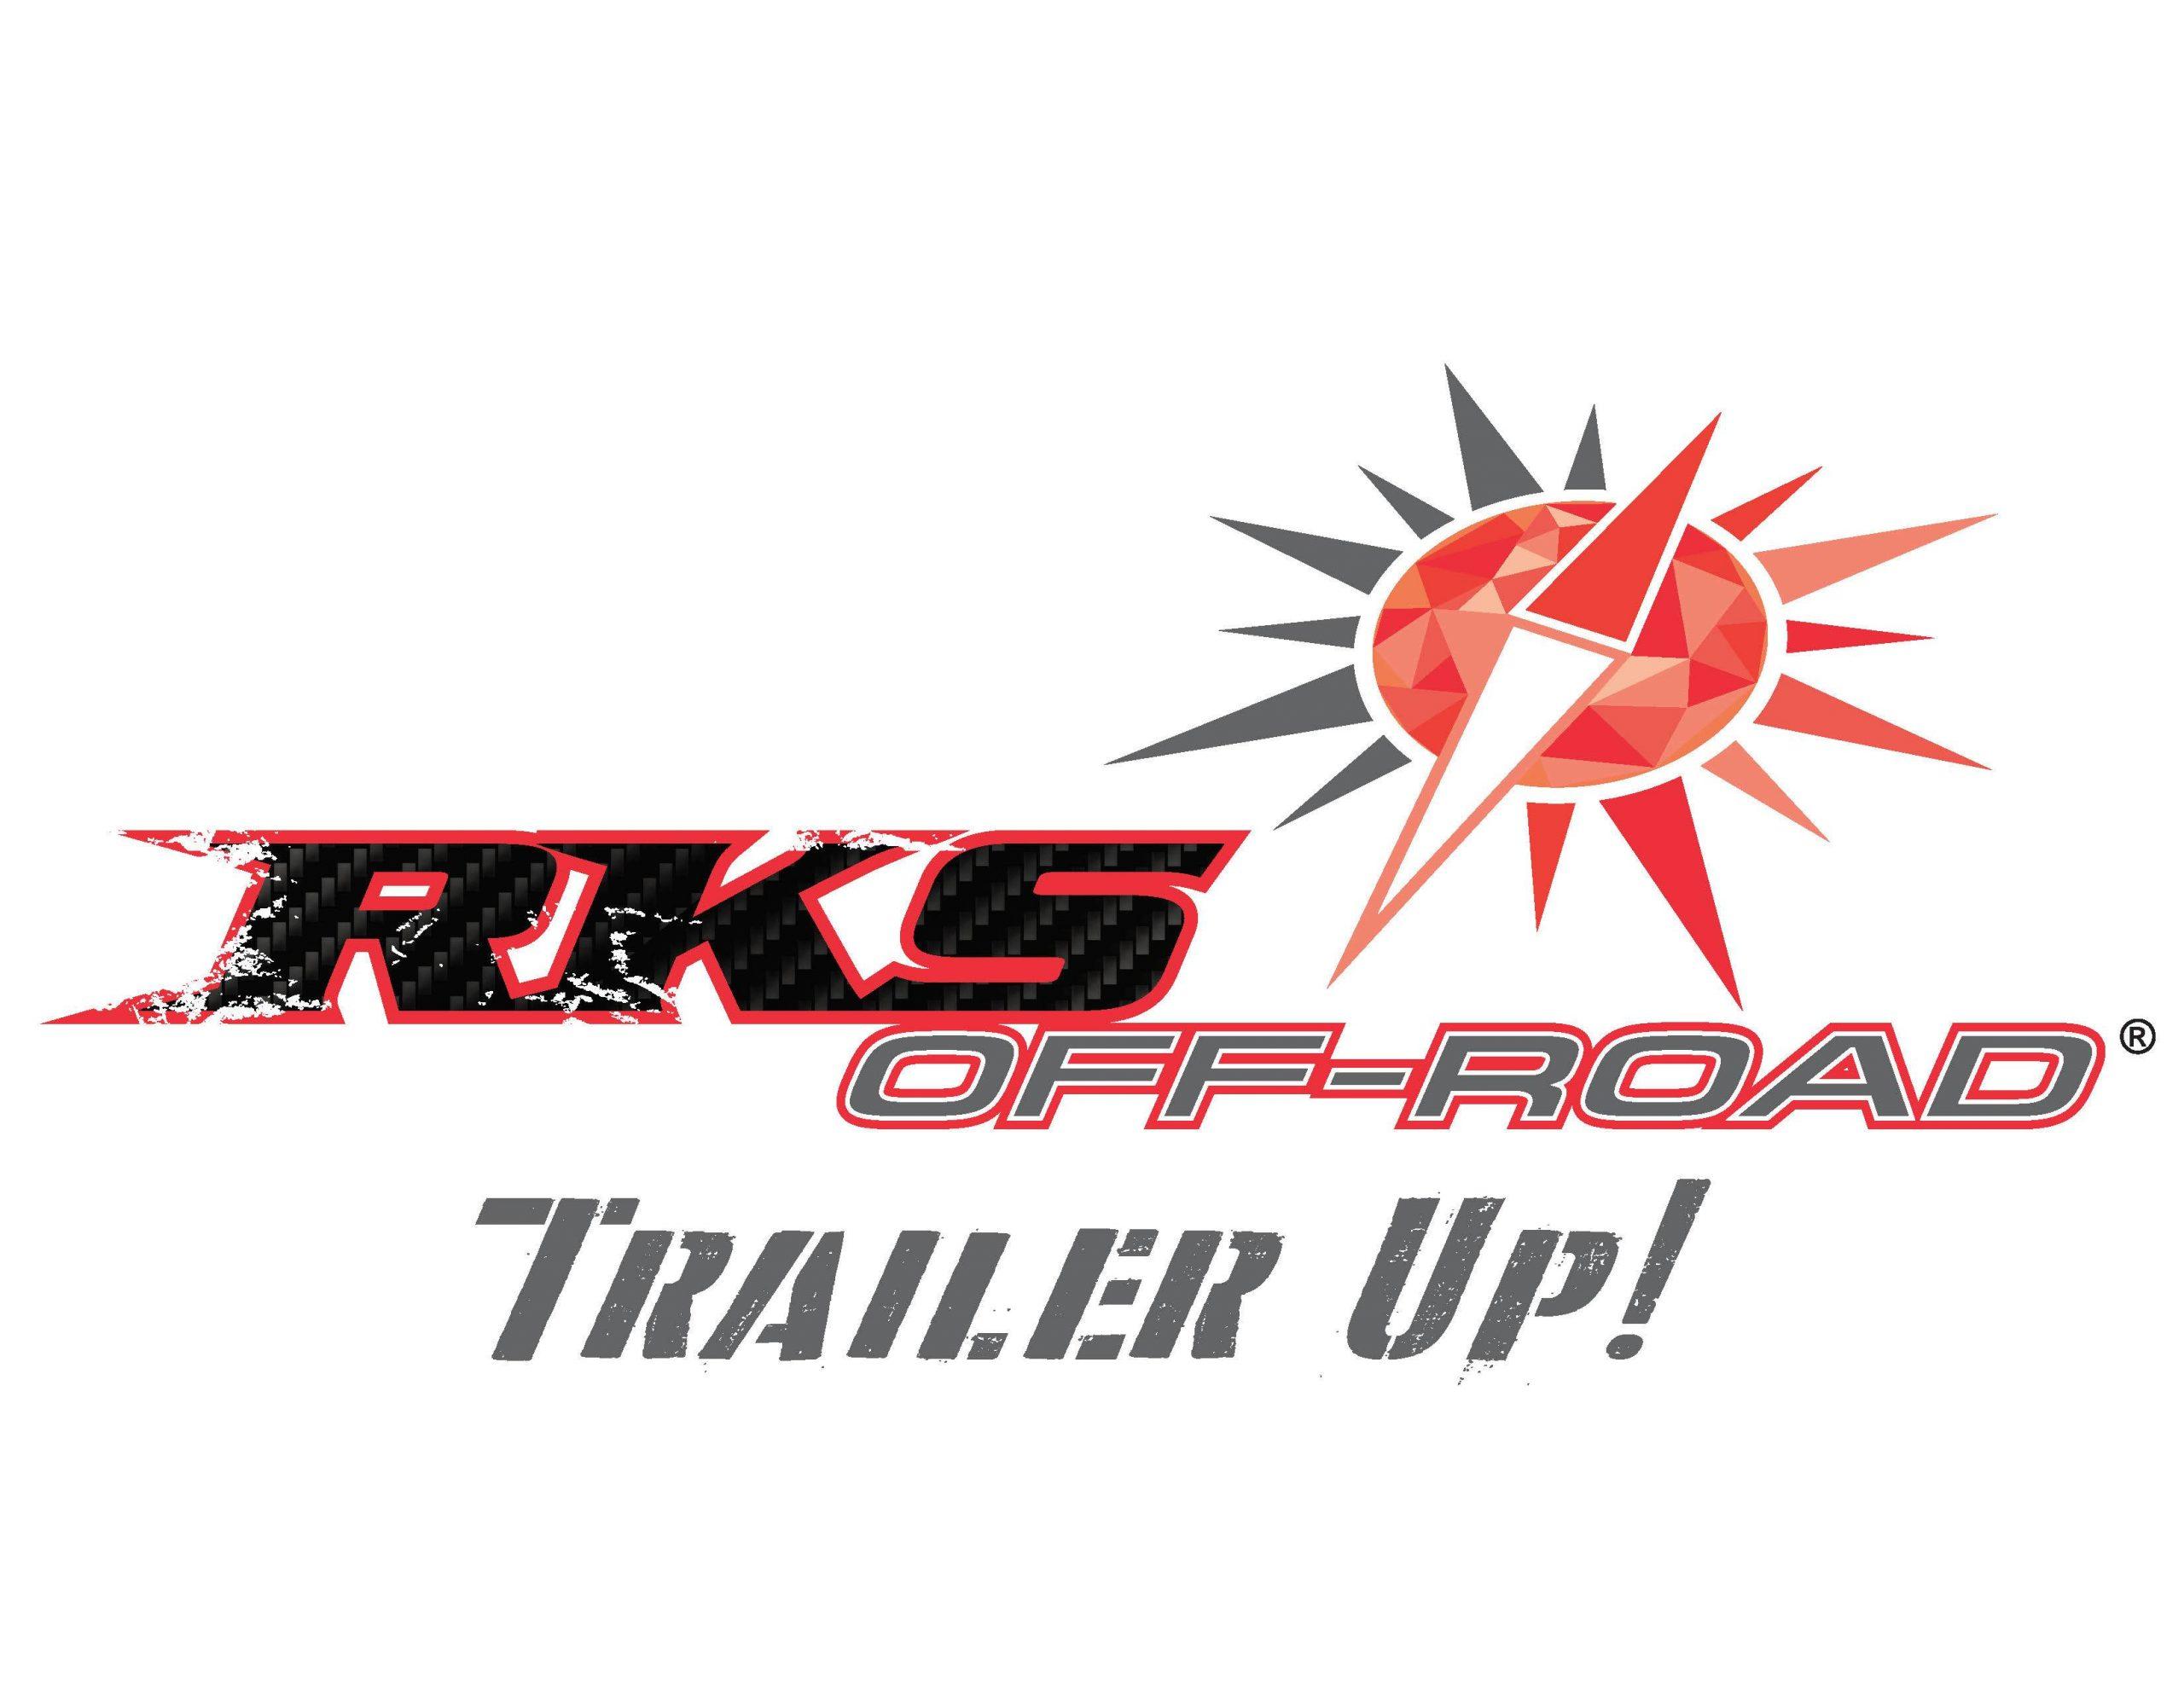 The RKS Purpose Trailer